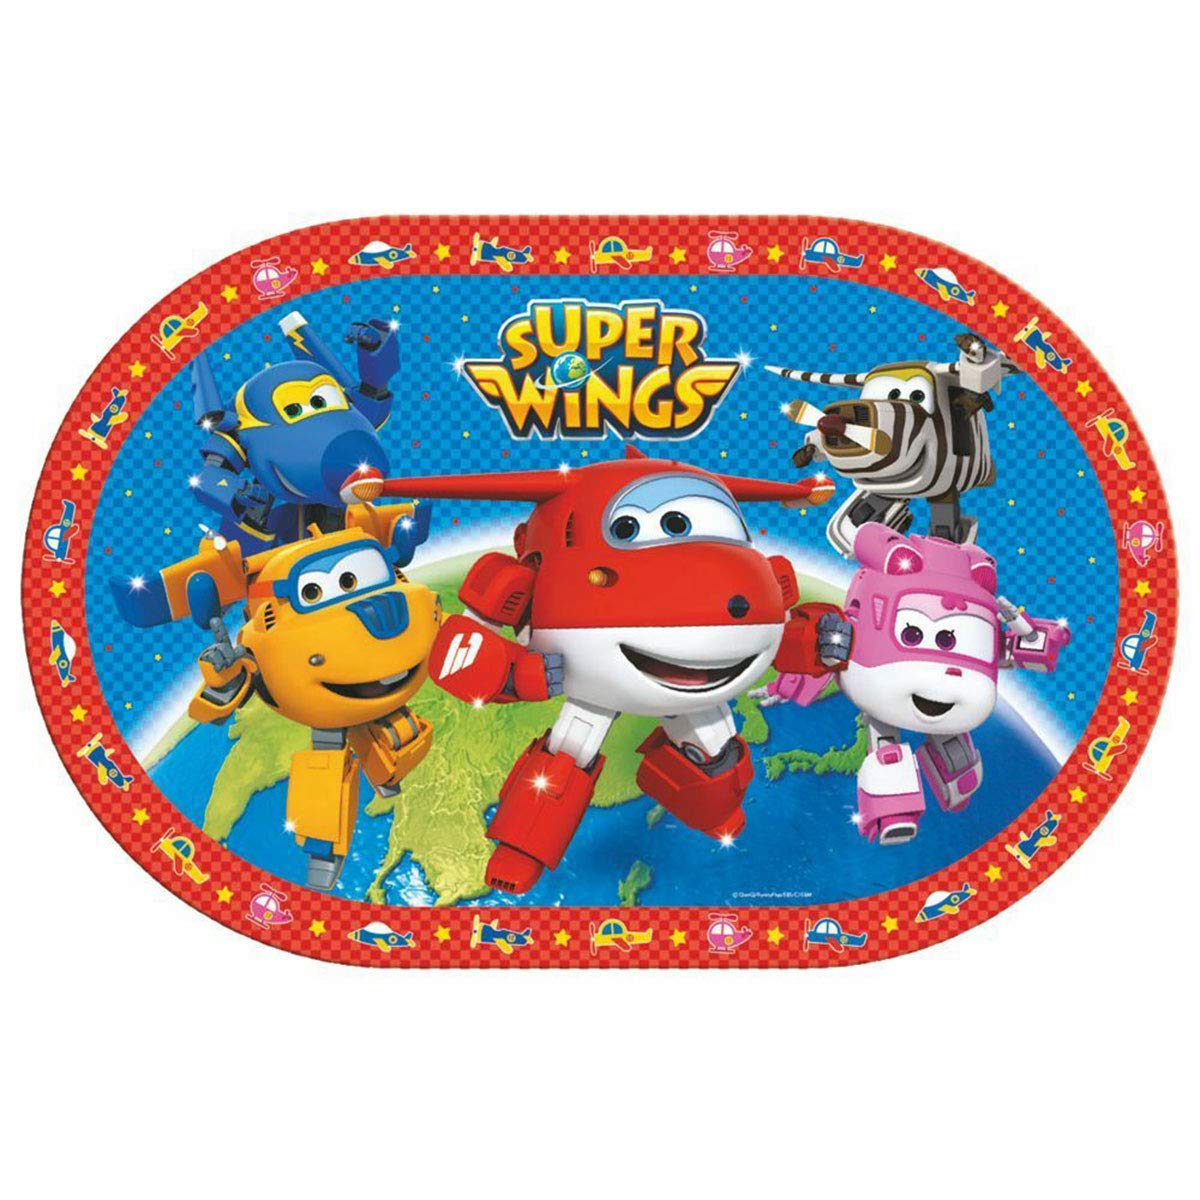 Set da pranzo per bambini Super Wings 4 pezzi in plastica